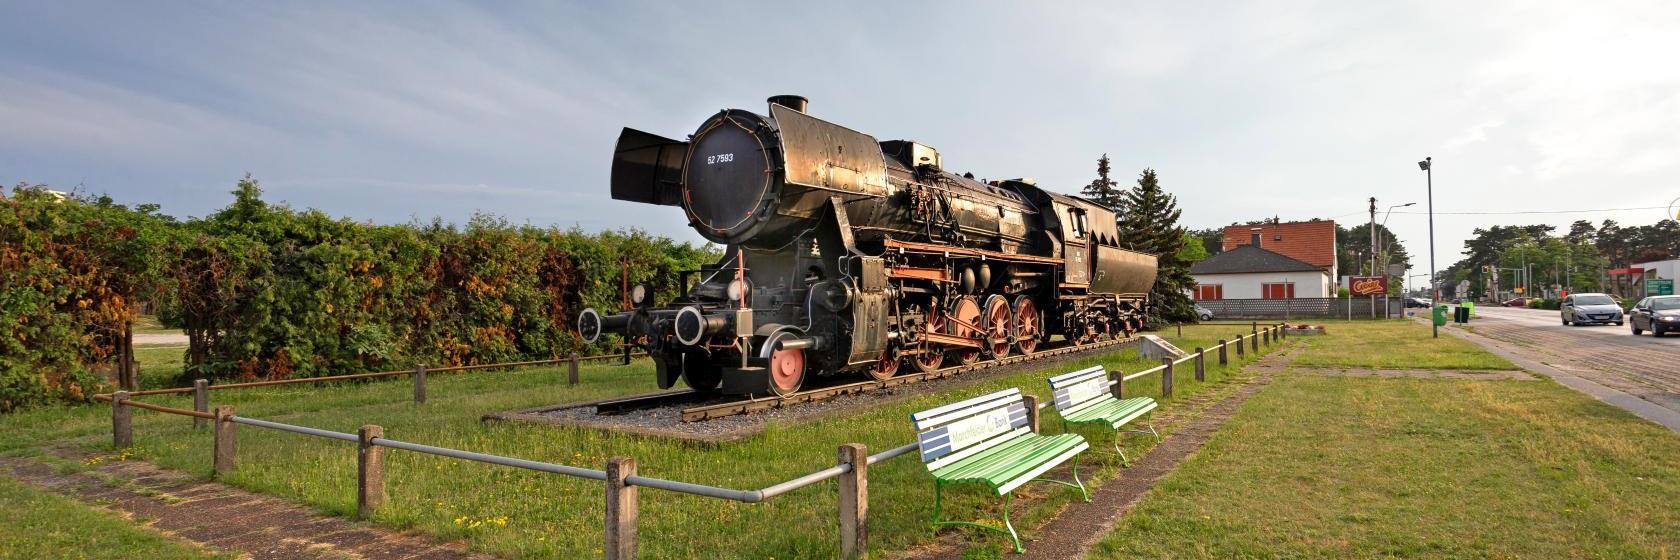 KUMST-Art-Activity - Aktivtage - in Strasshof an der Nordbahn